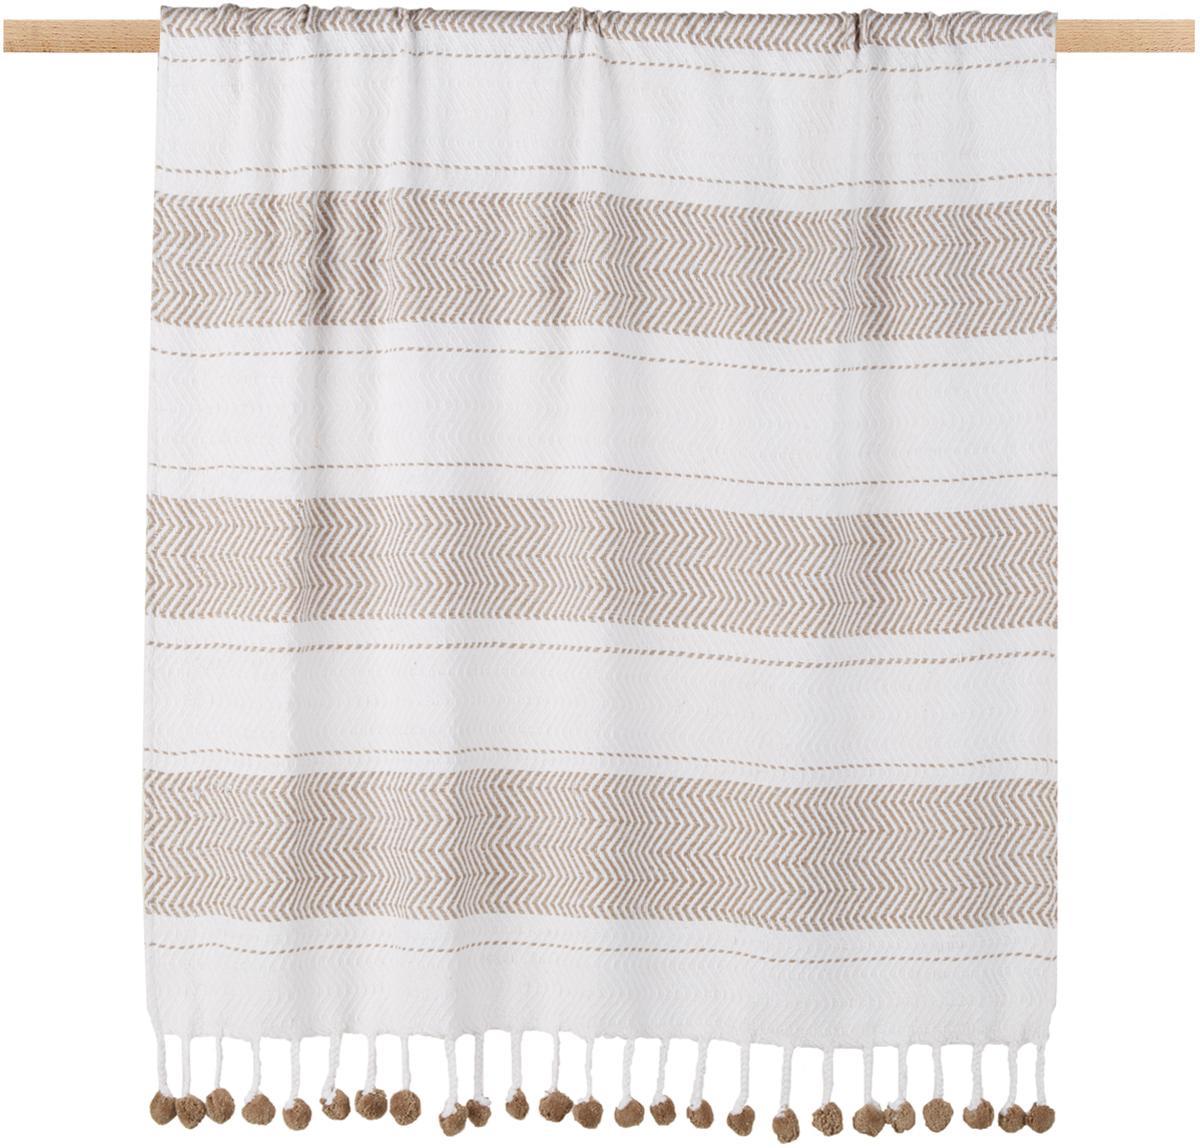 Manta Pom Pom, Algodón, Blanco crudo, gris pardo, An 130 x L 170 cm